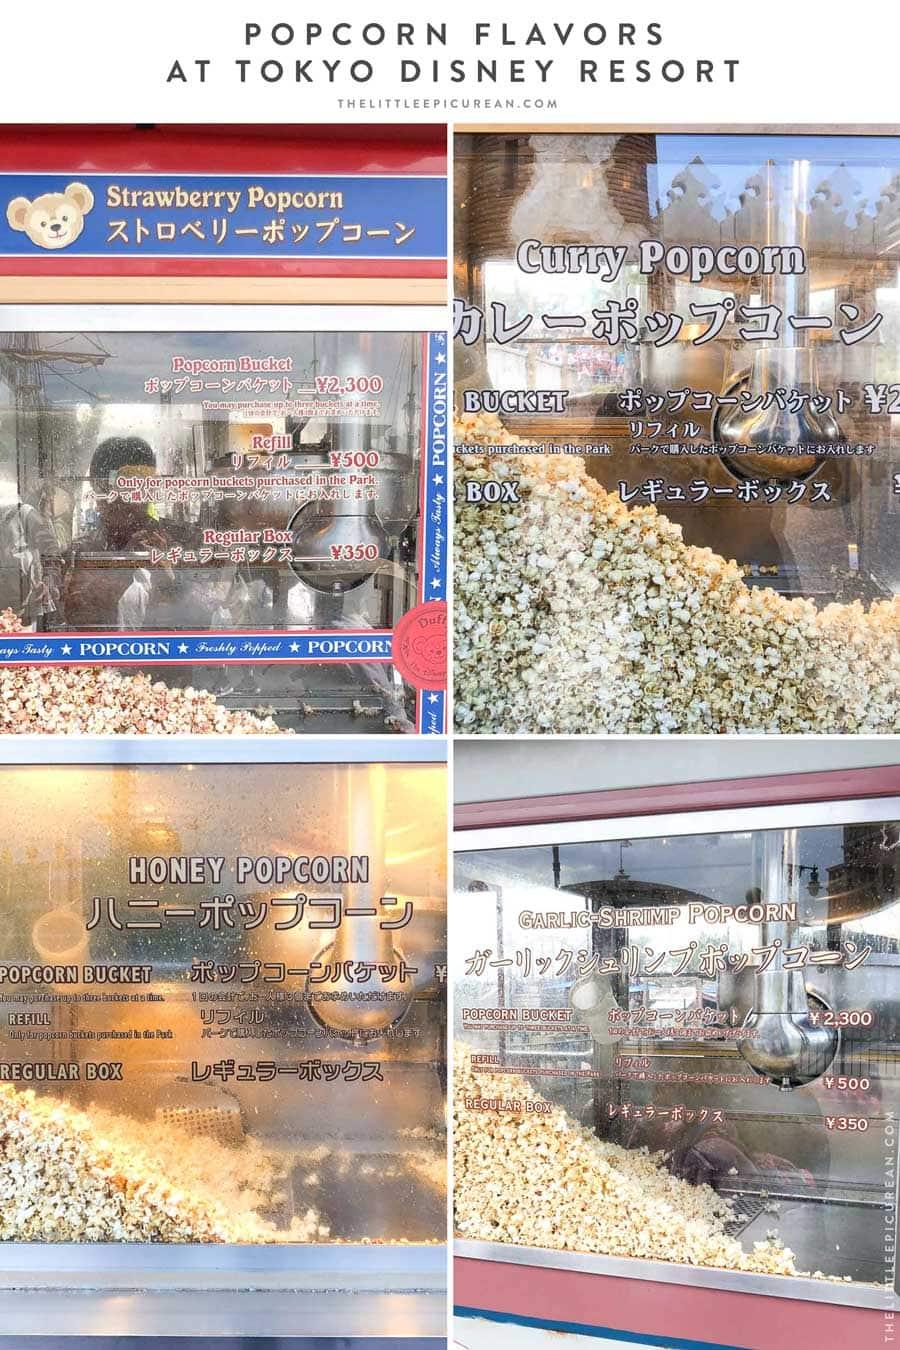 Guide to Popcorn Flavors at Tokyo Disney Resort